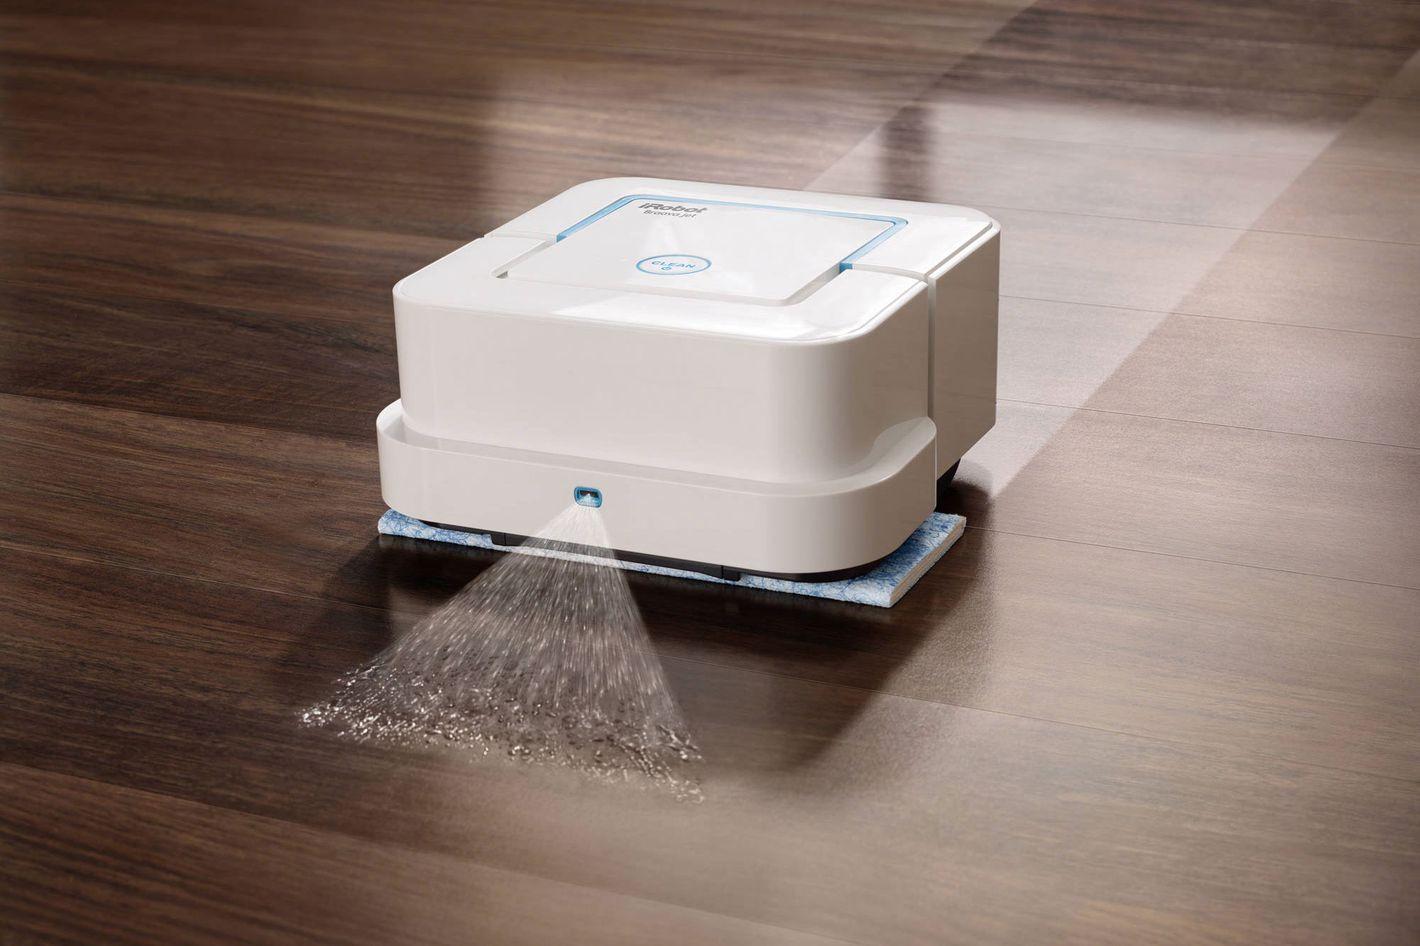 iRobot Braava Jet 240 Robot Mop- strategist best smart kitchen appliances